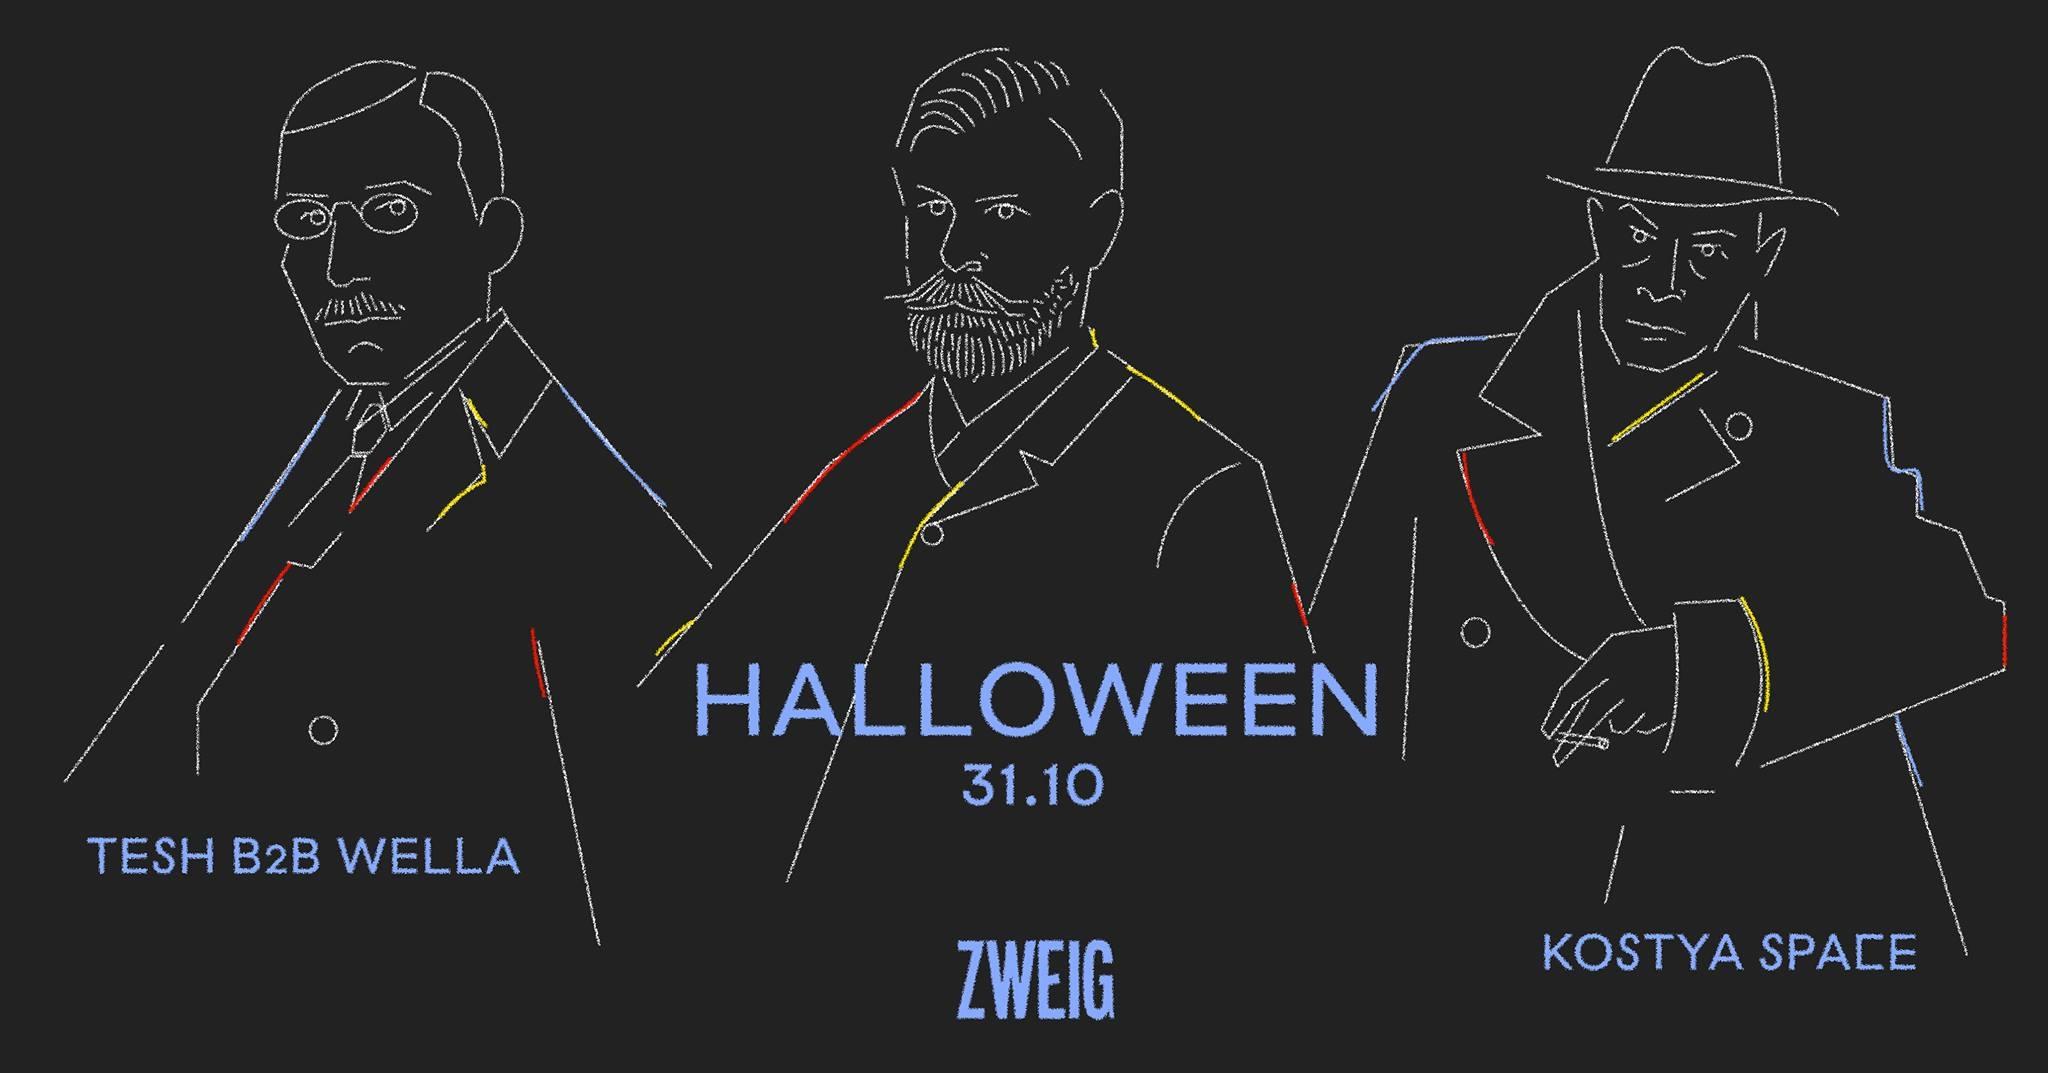 куда пойти на хэллоуин